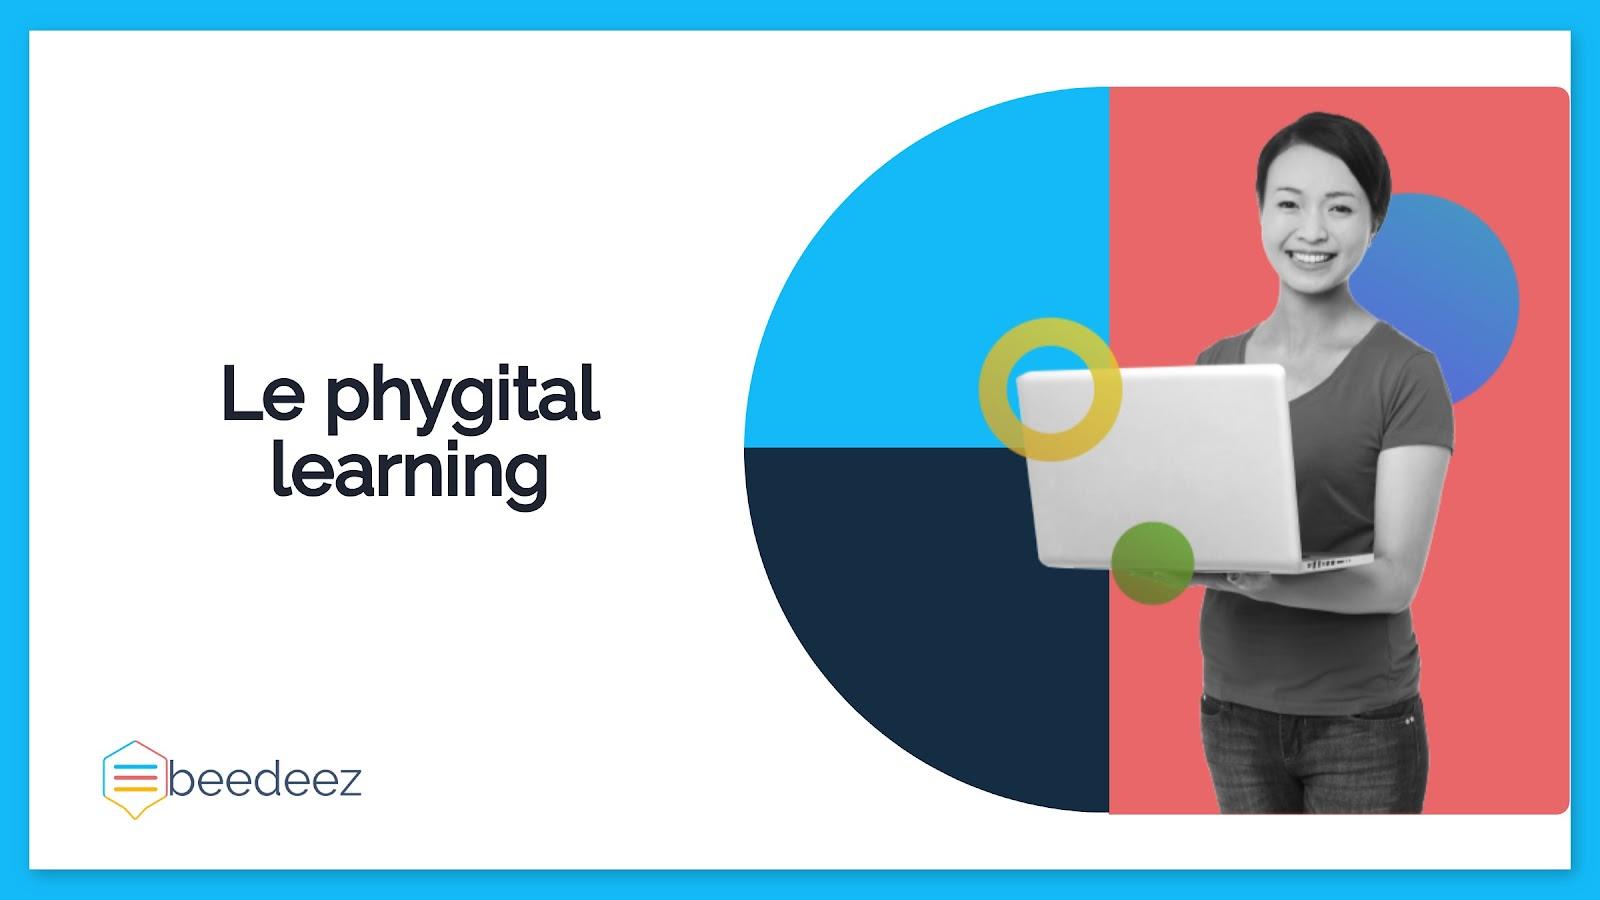 phygital learning